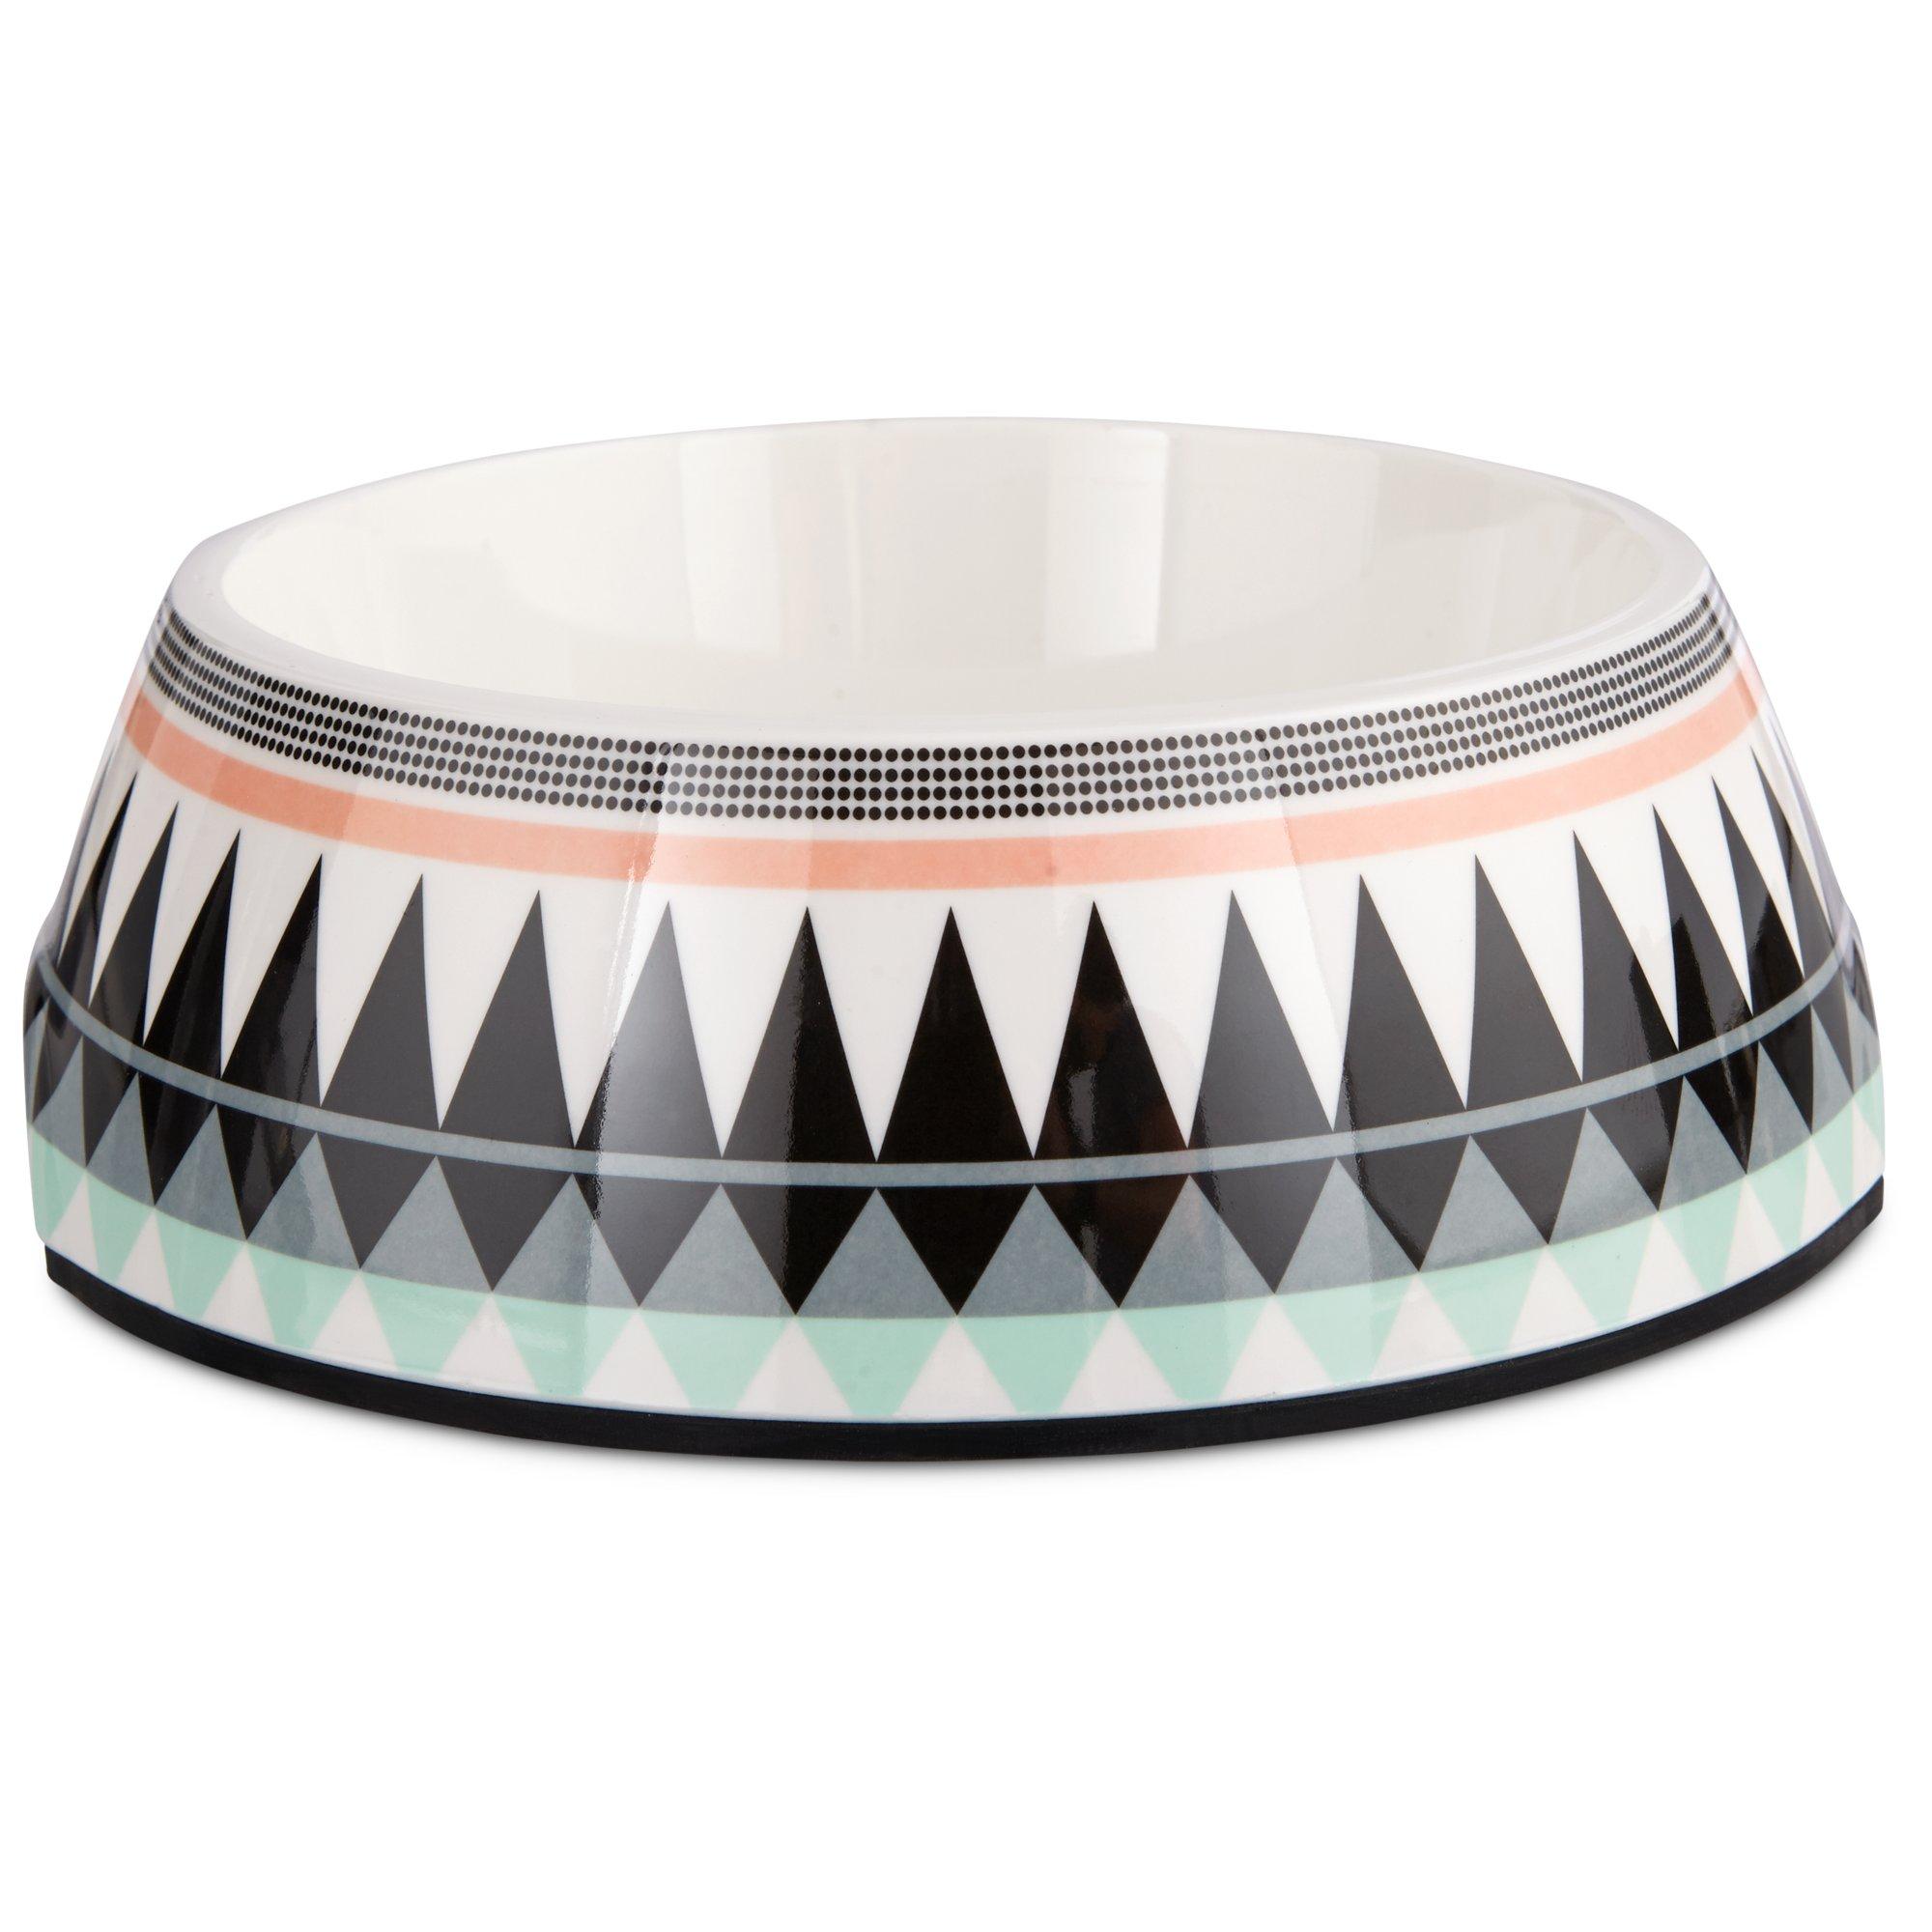 Image of Bowlmates Aztec Print Single Round Base, 1.75 Cup, Small, Black / Multi-Color